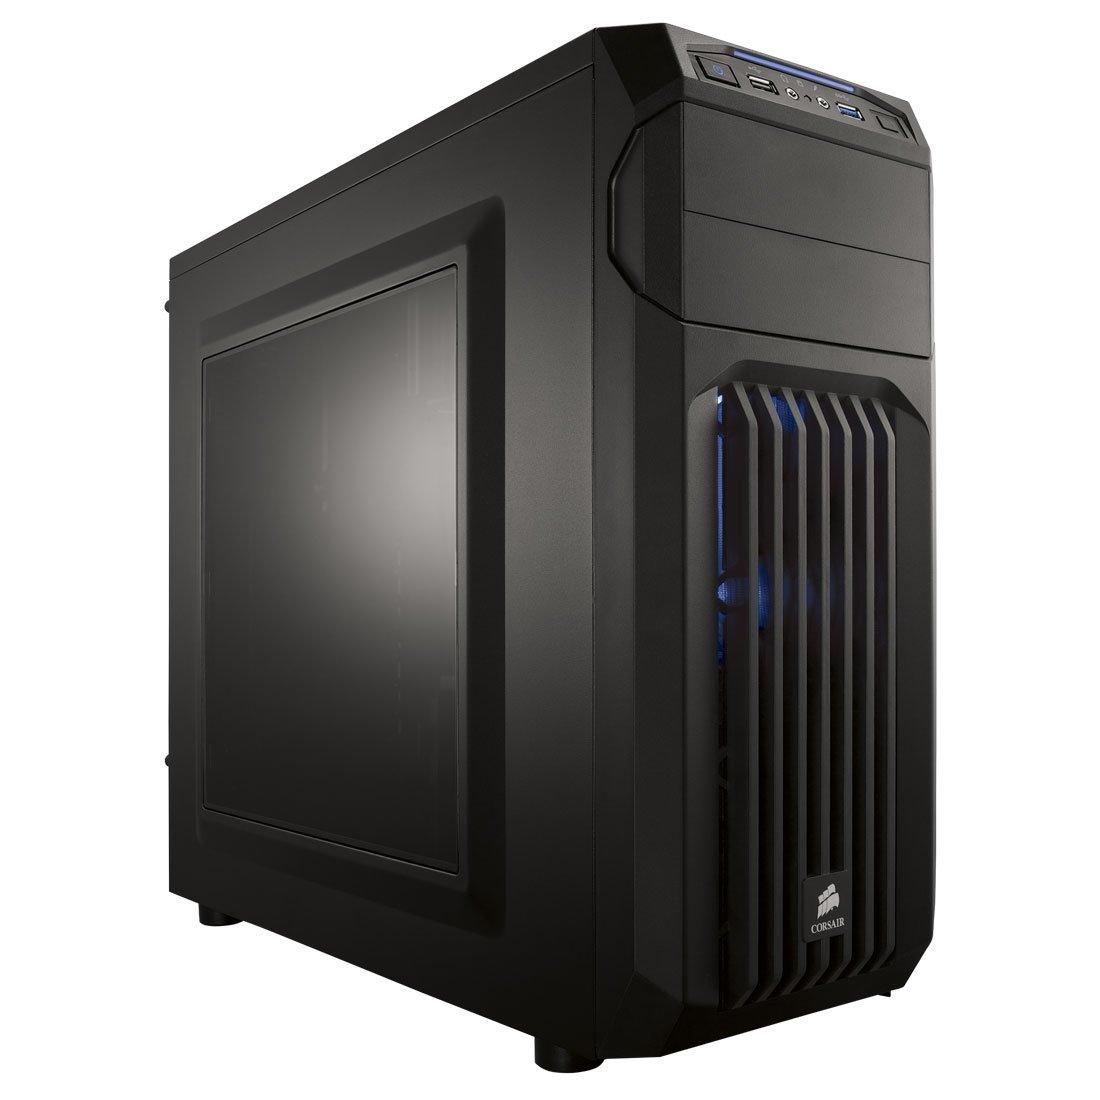 Amazon.com  Adamant Custom Home Tower Desktop Computer Intel Core i7 7700  3.6Ghz 8Gb DDR4 4TB HDD 250Gb SSD WIN10 650W PSU  Computers   Accessories 7e106be8c059